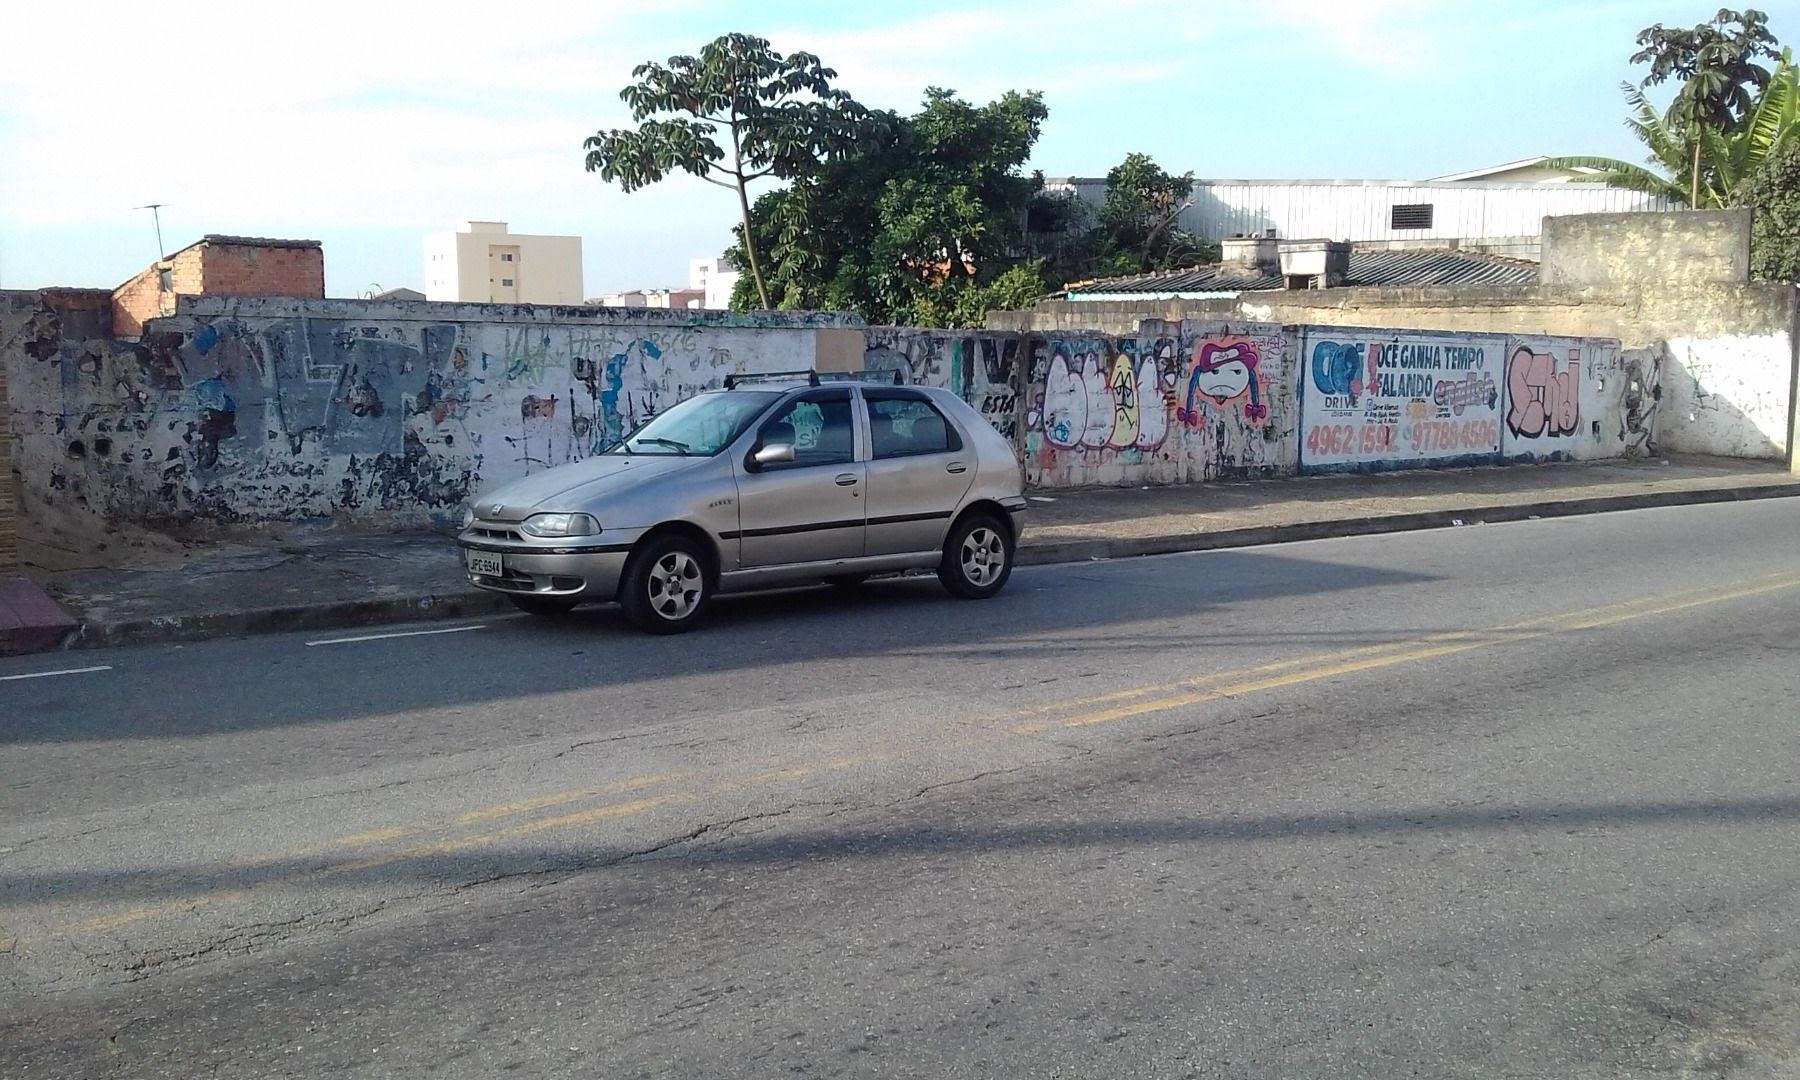 Terreno à venda, 512 m² por R$ 1.500.000,00 - Jardim Santa Cecília - Guarulhos/SP